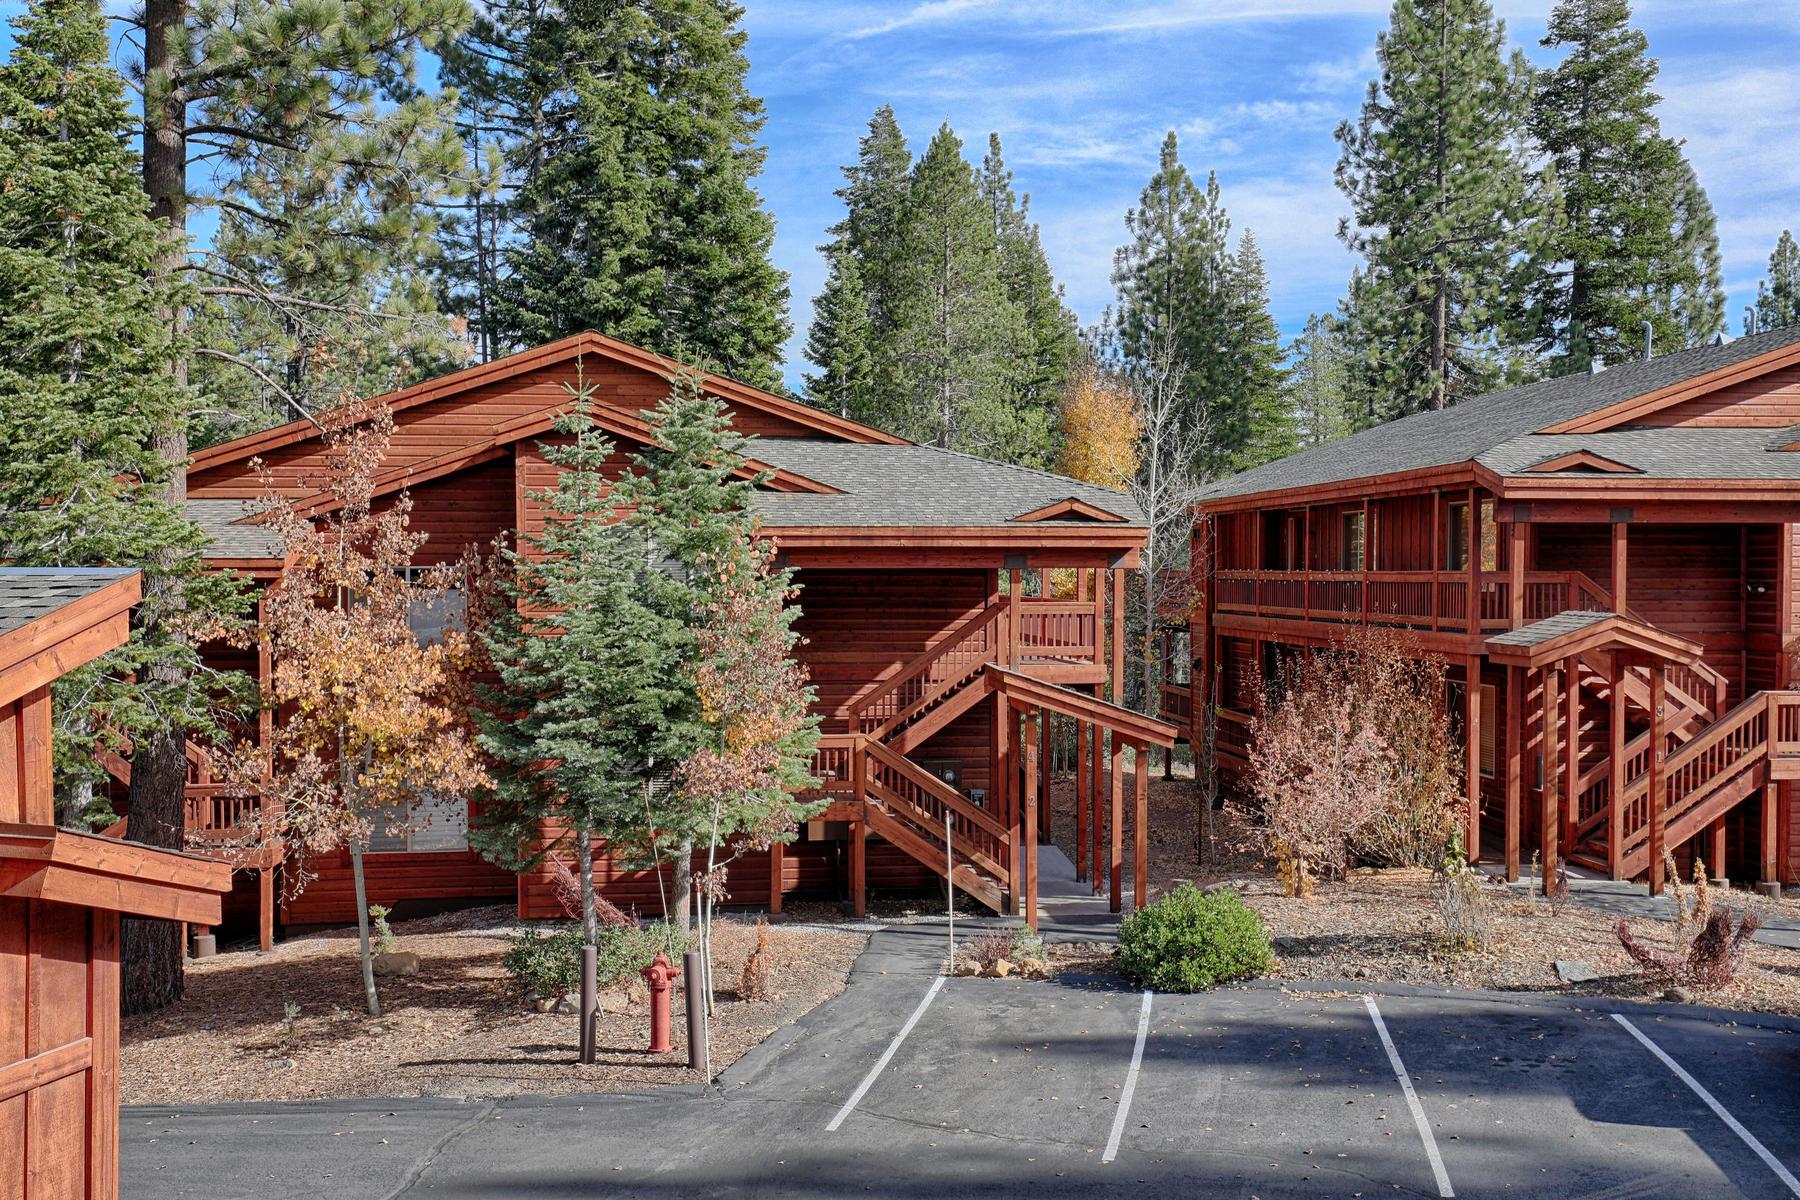 Condominium for Active at 12719 Hidden Circle #2, Truckee, Ca 96161 12719 Hidden Circle #2 Truckee, California 96161 United States